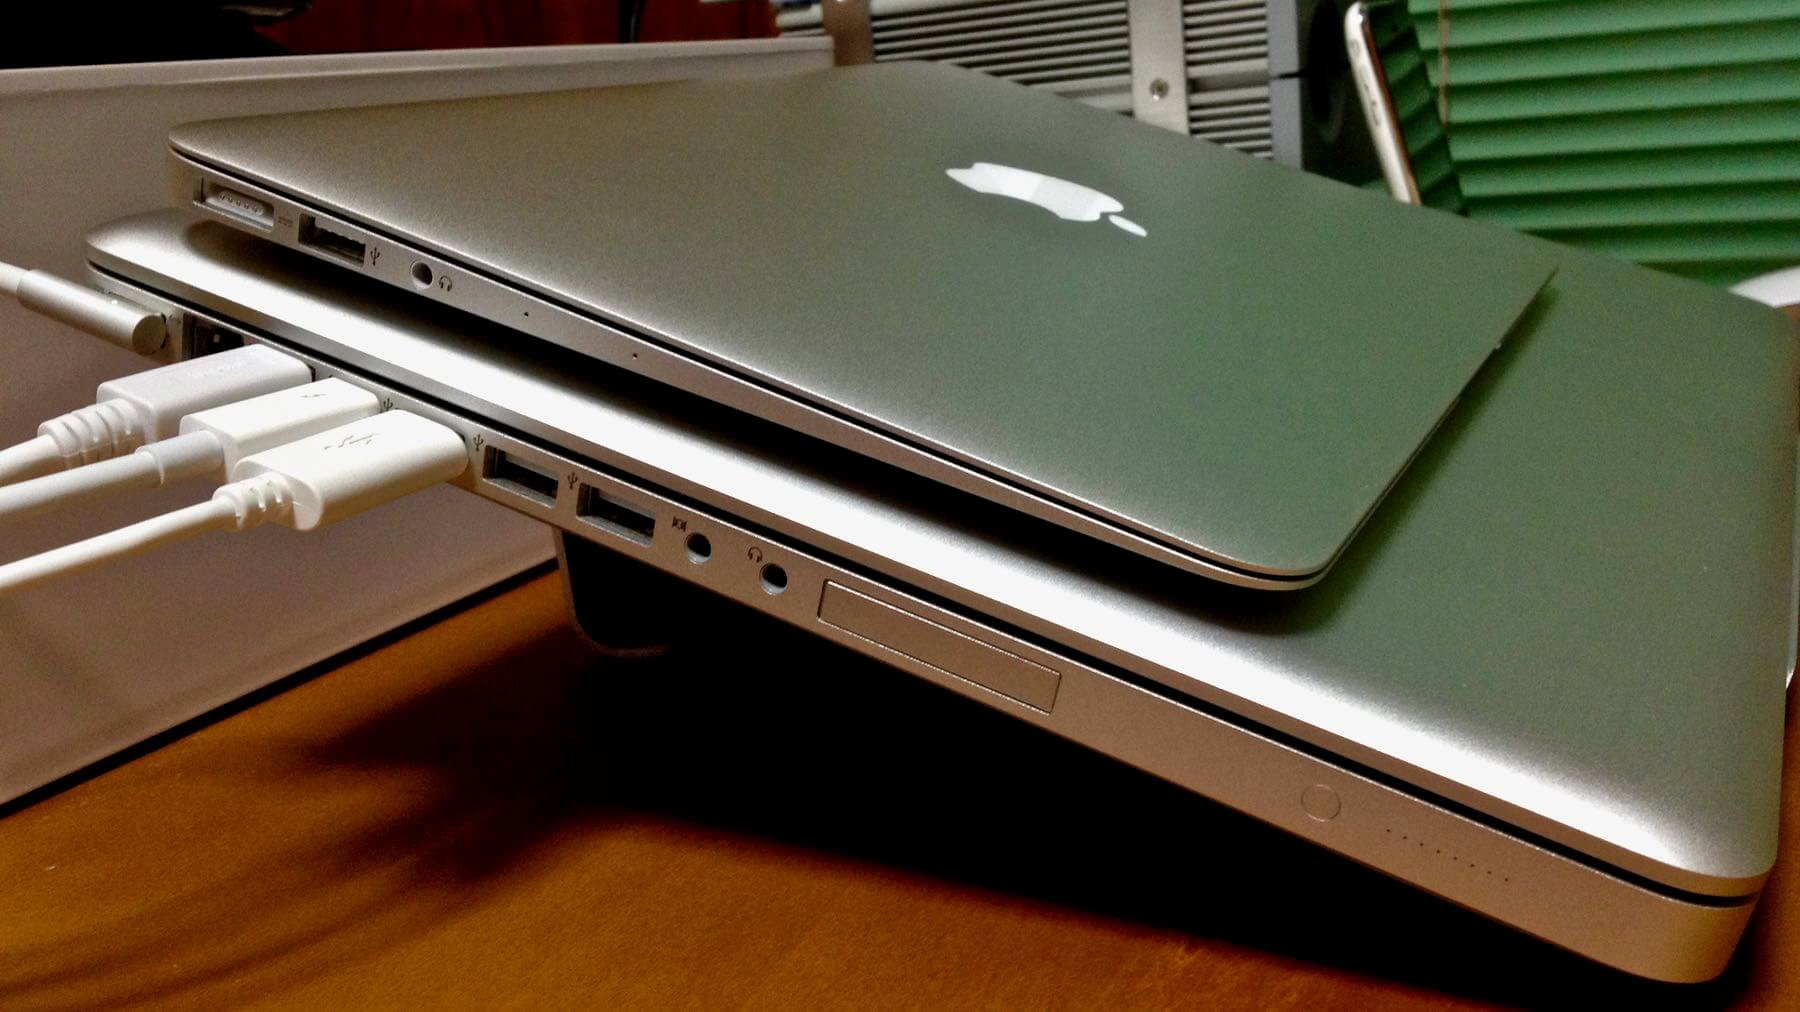 08 MacBook Air2013 Mid 11inch Pro 2011 17inch